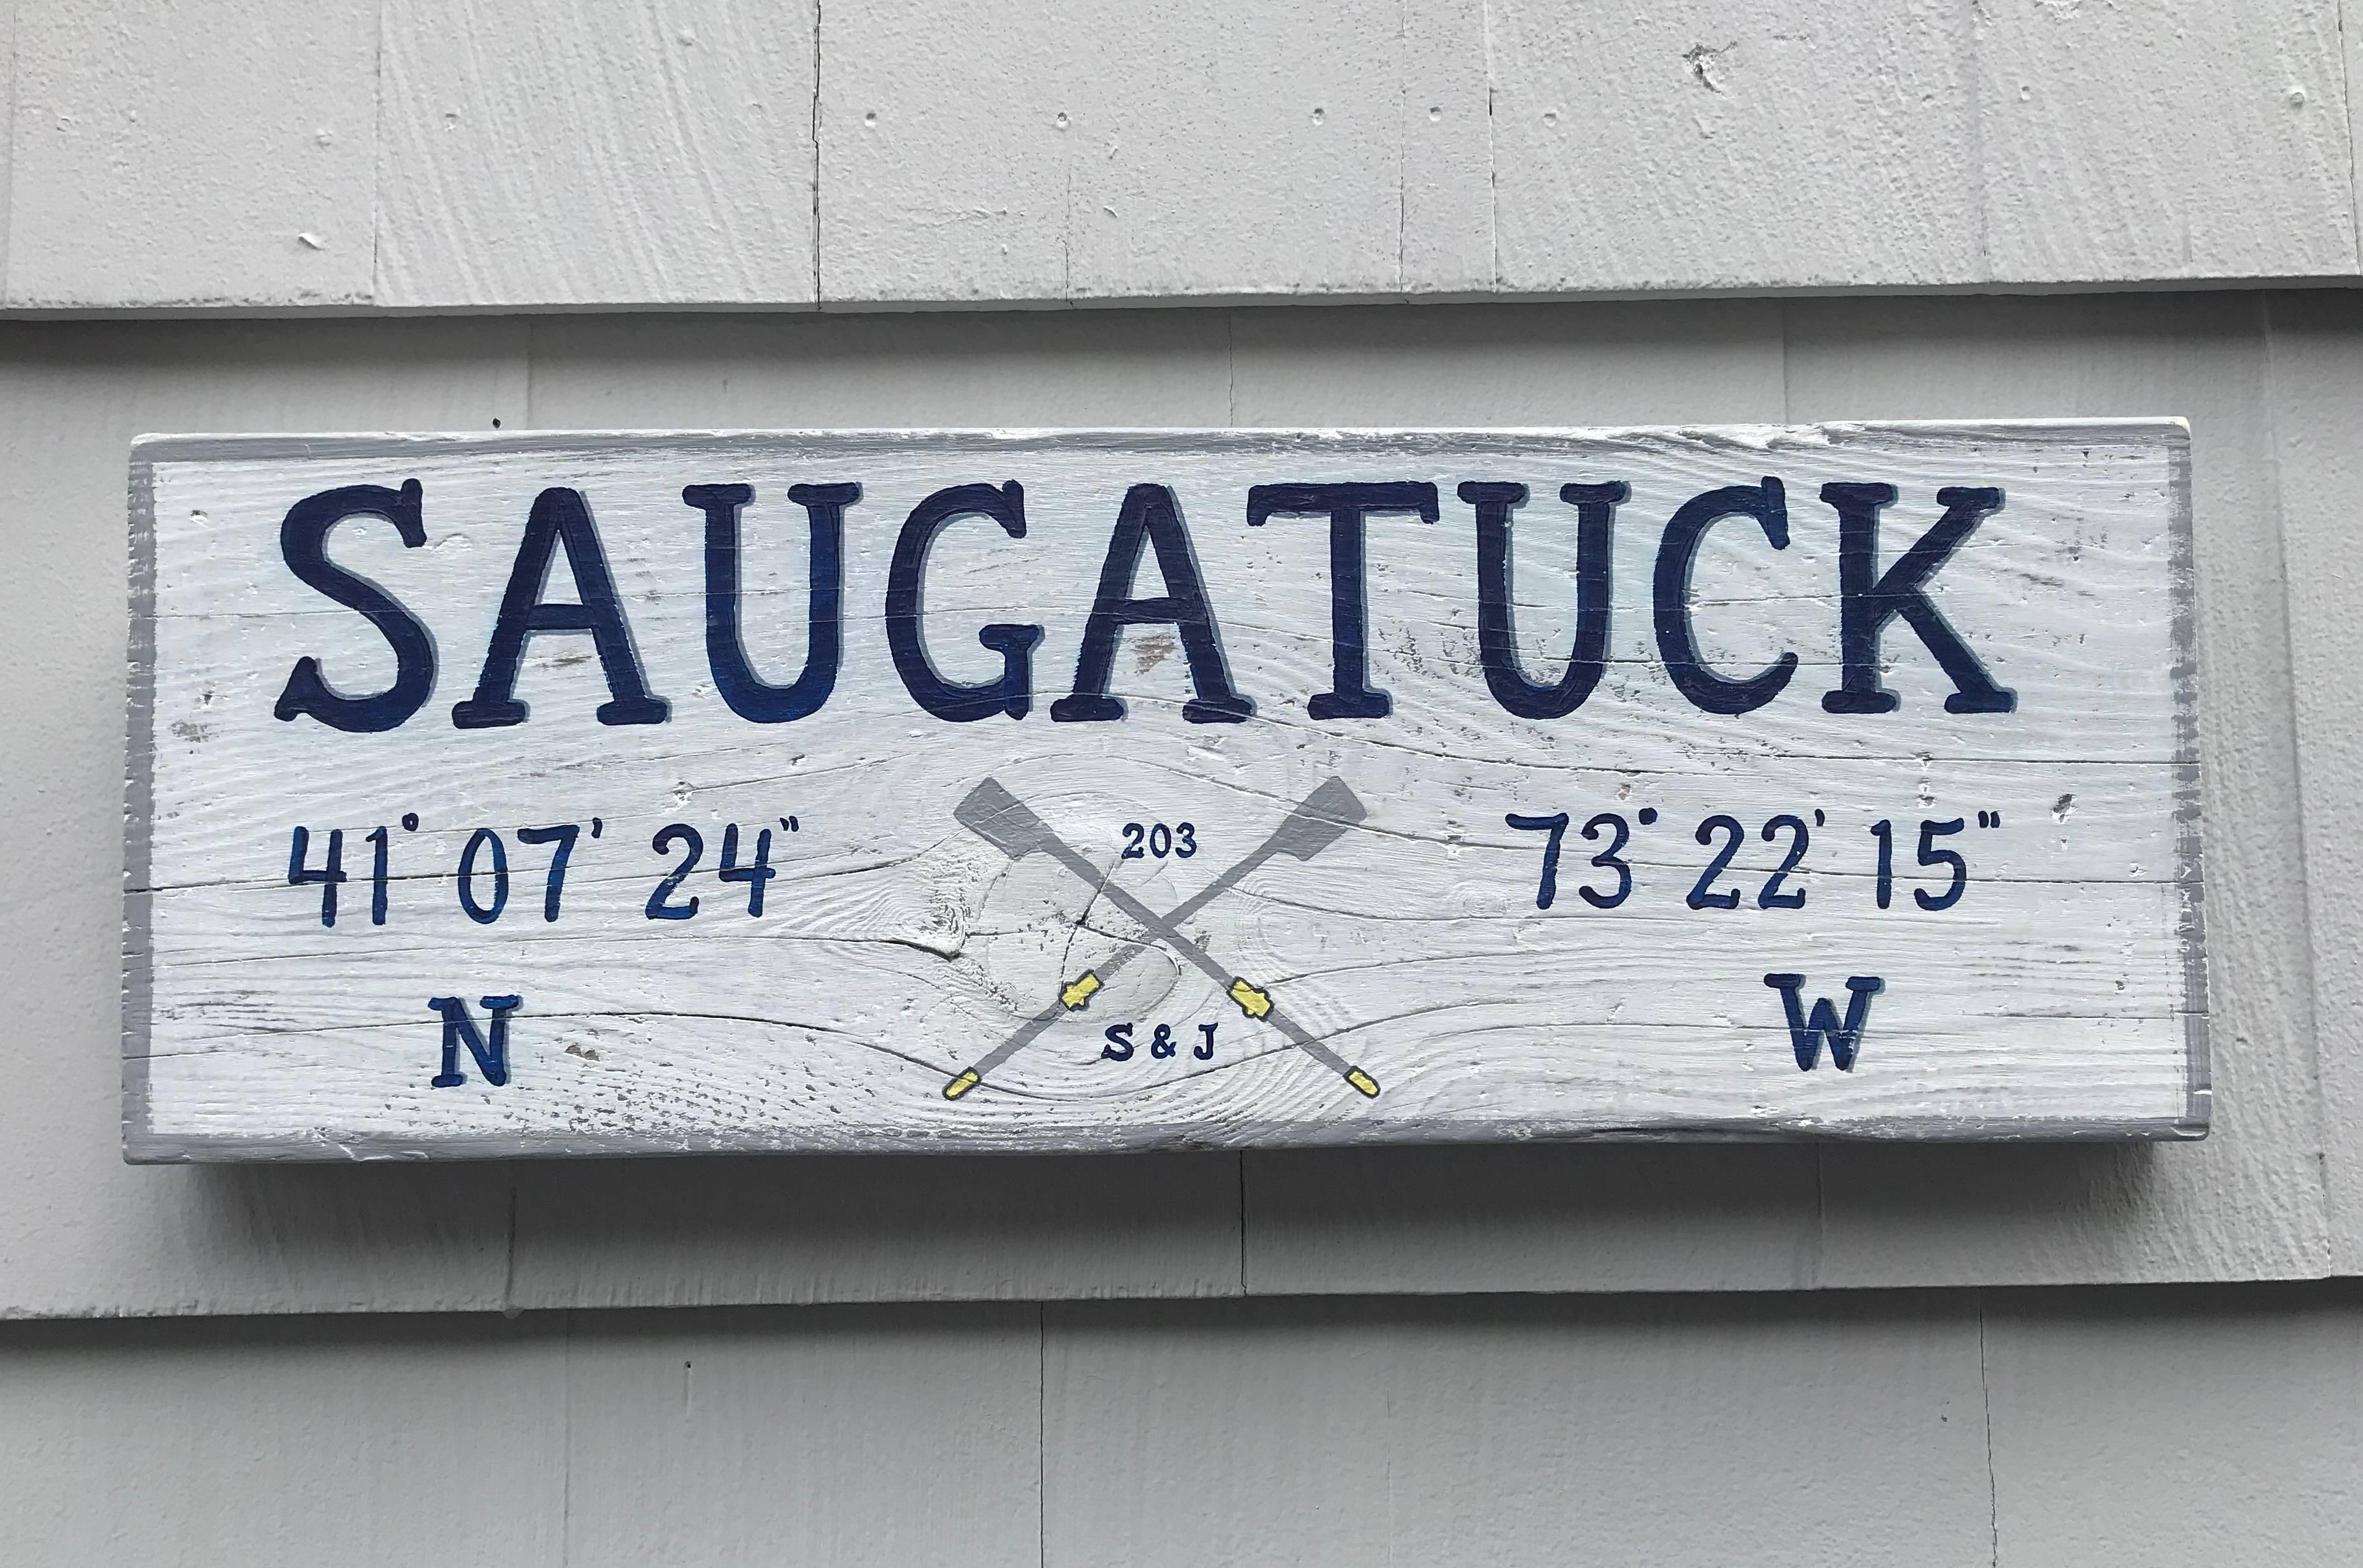 Saugatuck Rowing Club sign